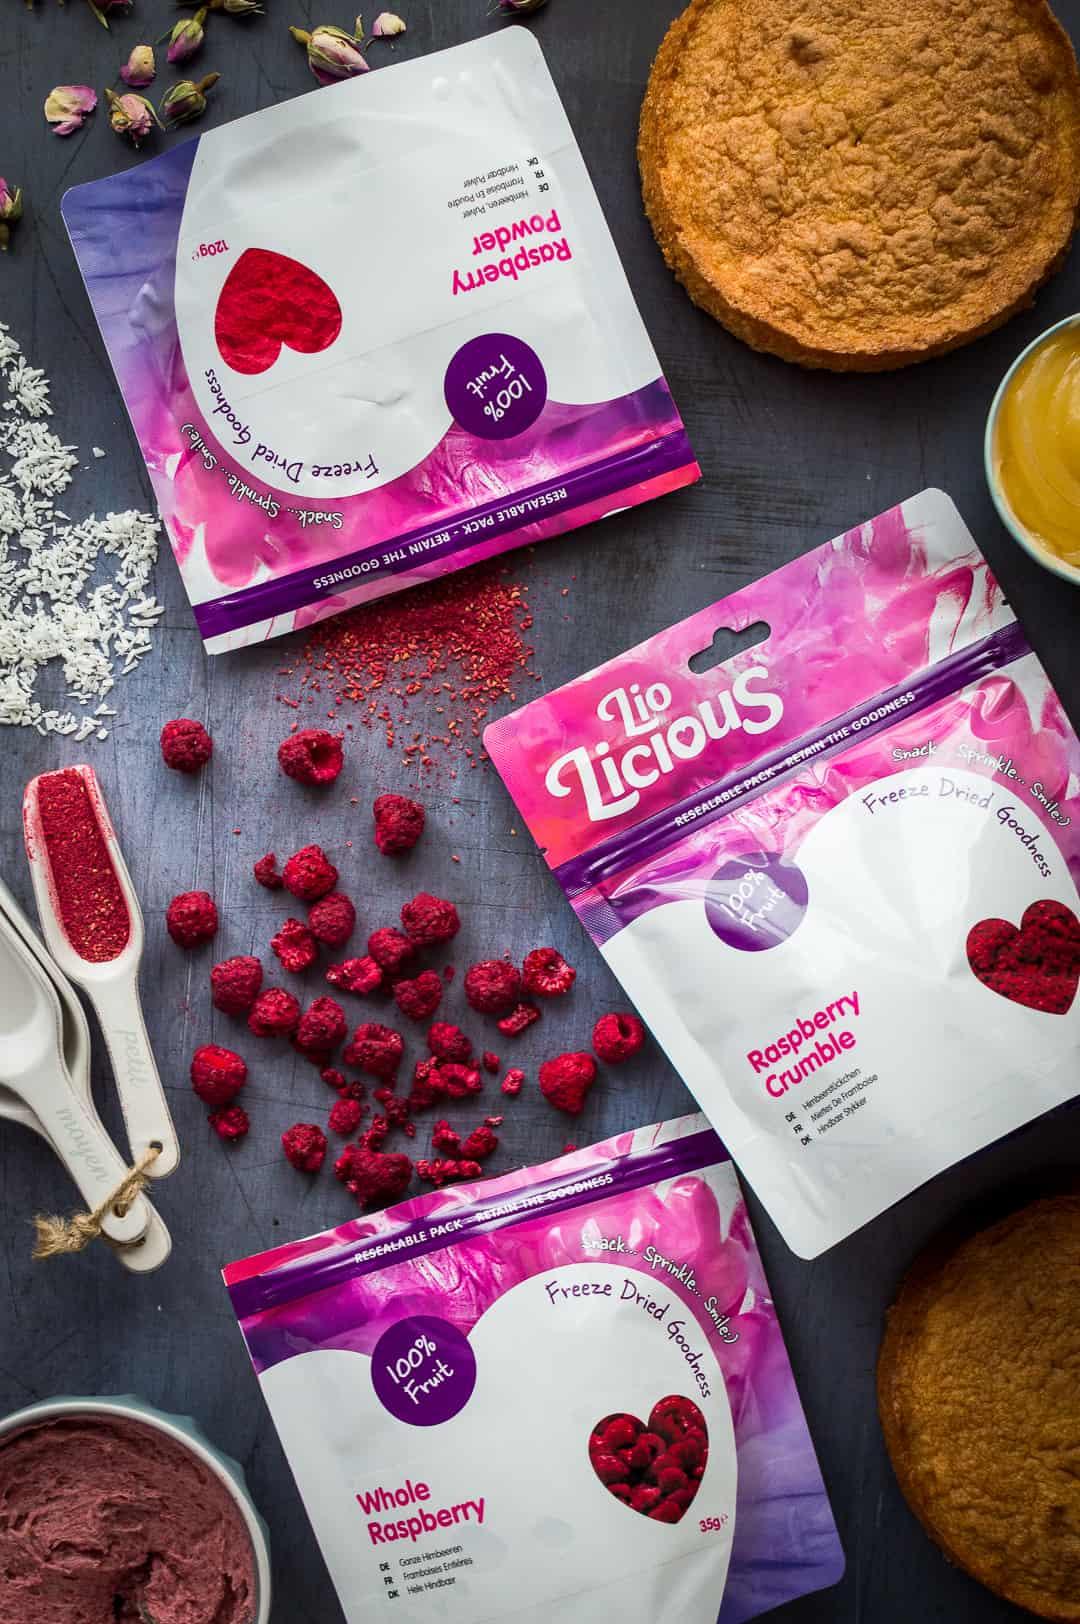 Lio-Licious freeze dried raspberries